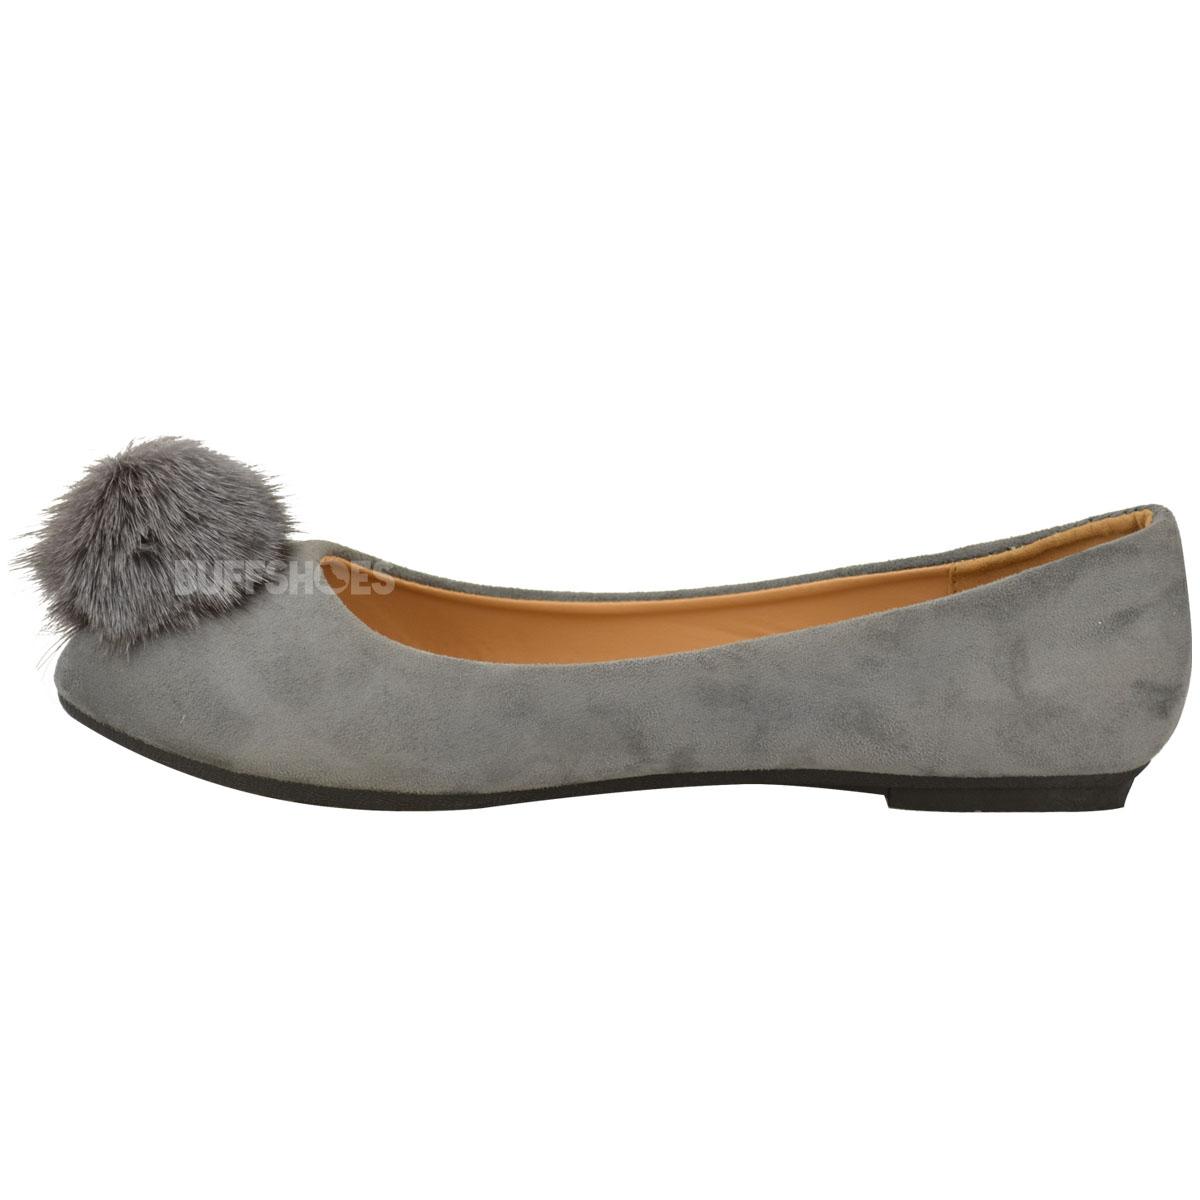 Womens Ladies Flat Slip On Dolly Shoes Ballet Pumps Fur